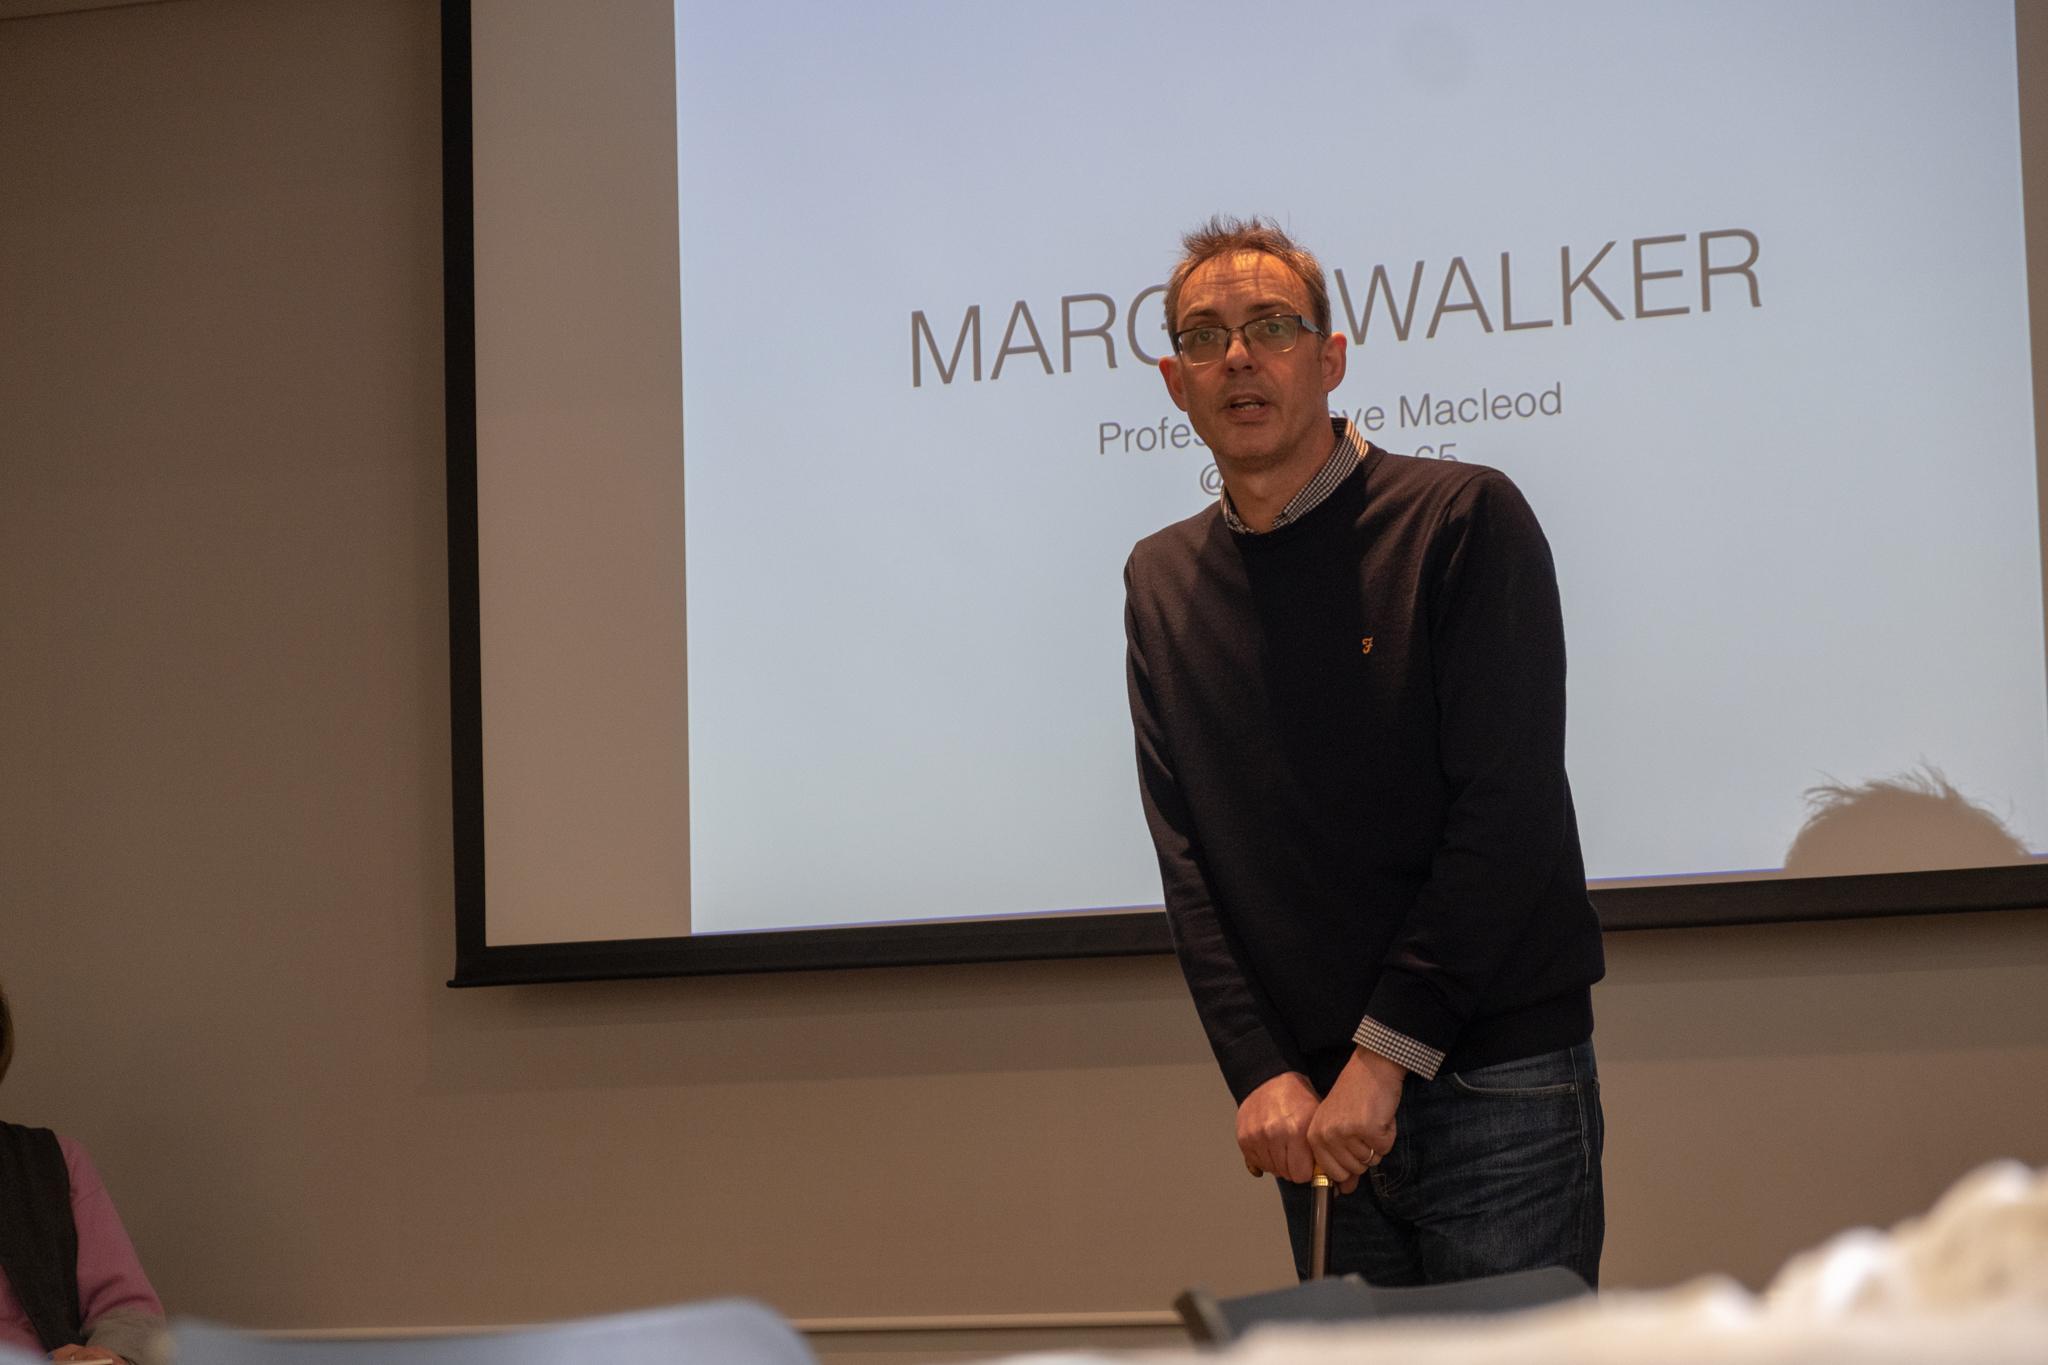 Professor Steve Macleod giving his 'Margin Walker' presentation. Taken by Graham Land, March, 2019